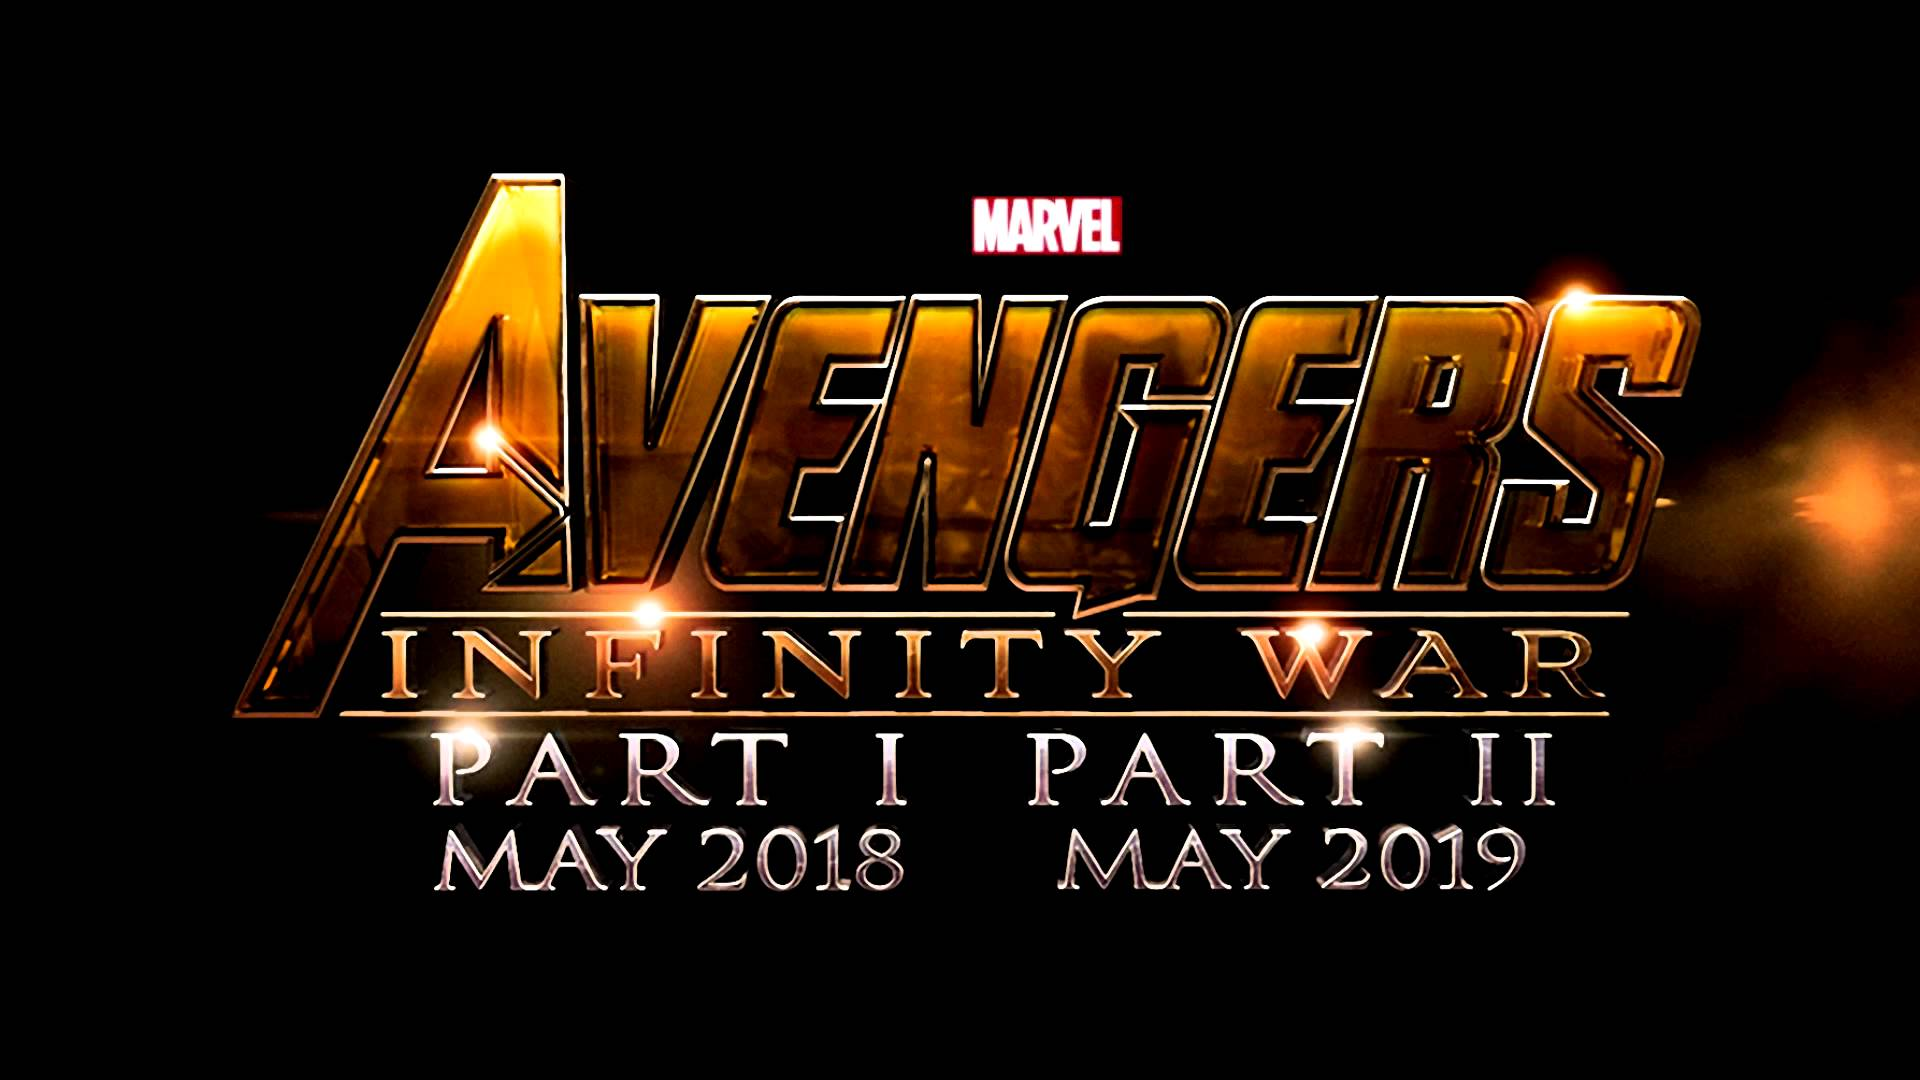 Avengers: Infinity War 1 & 2 (2018 & 2019)